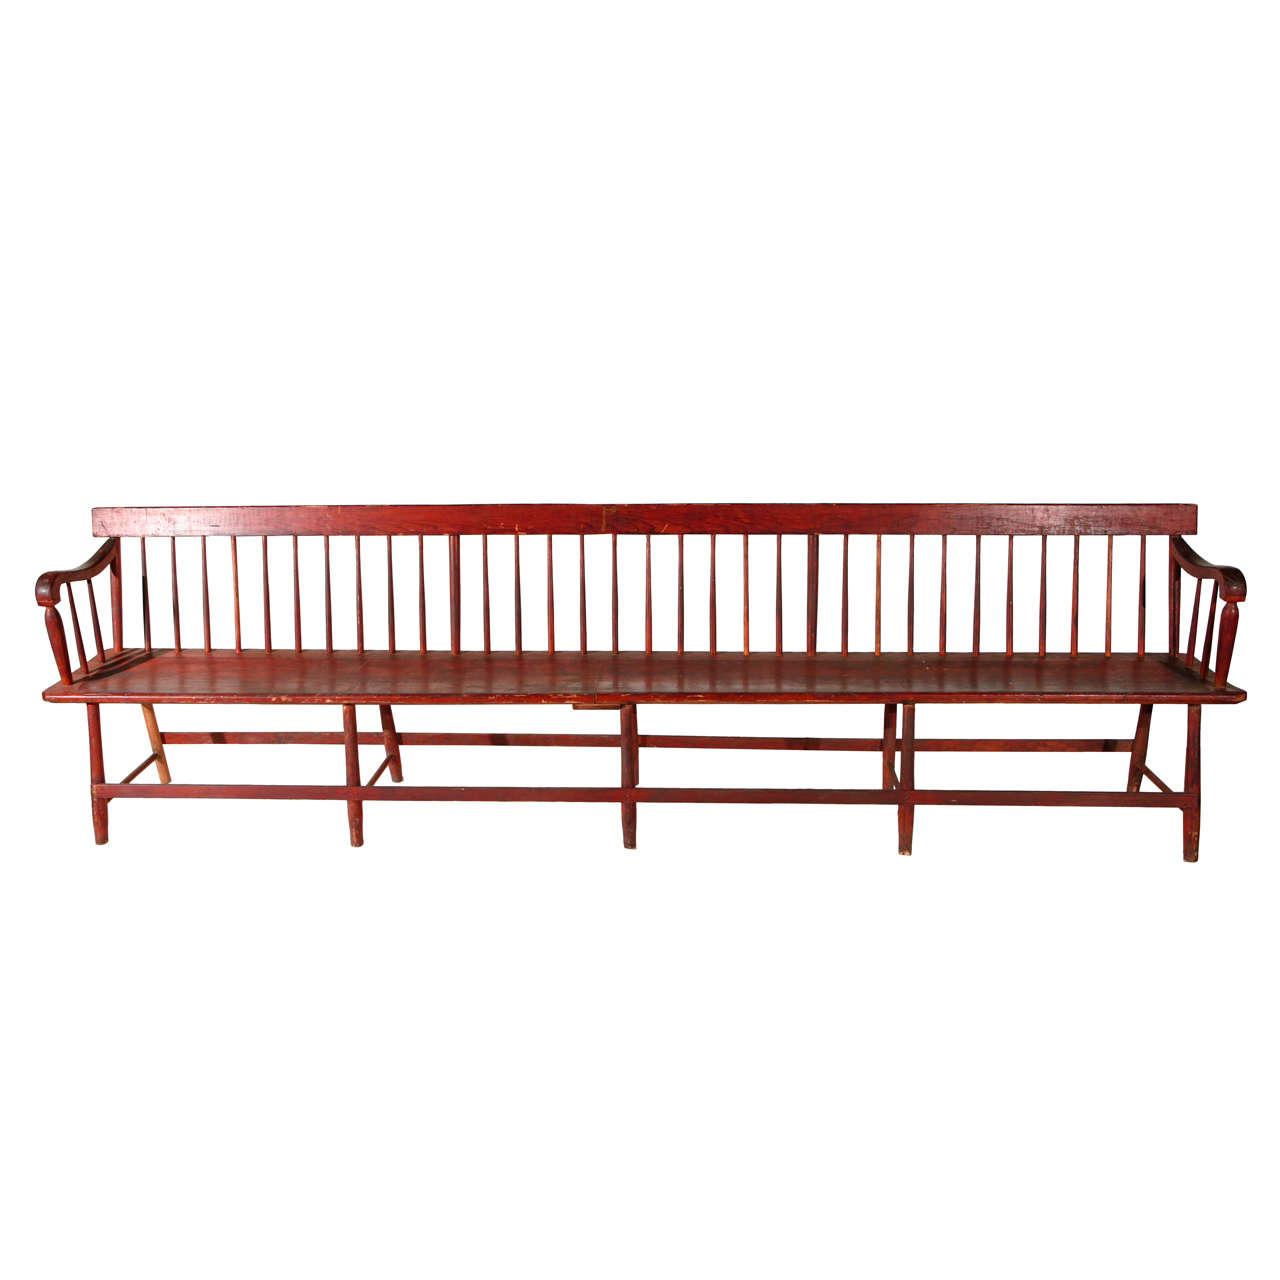 10 39 Long American Wood Bench At 1stdibs